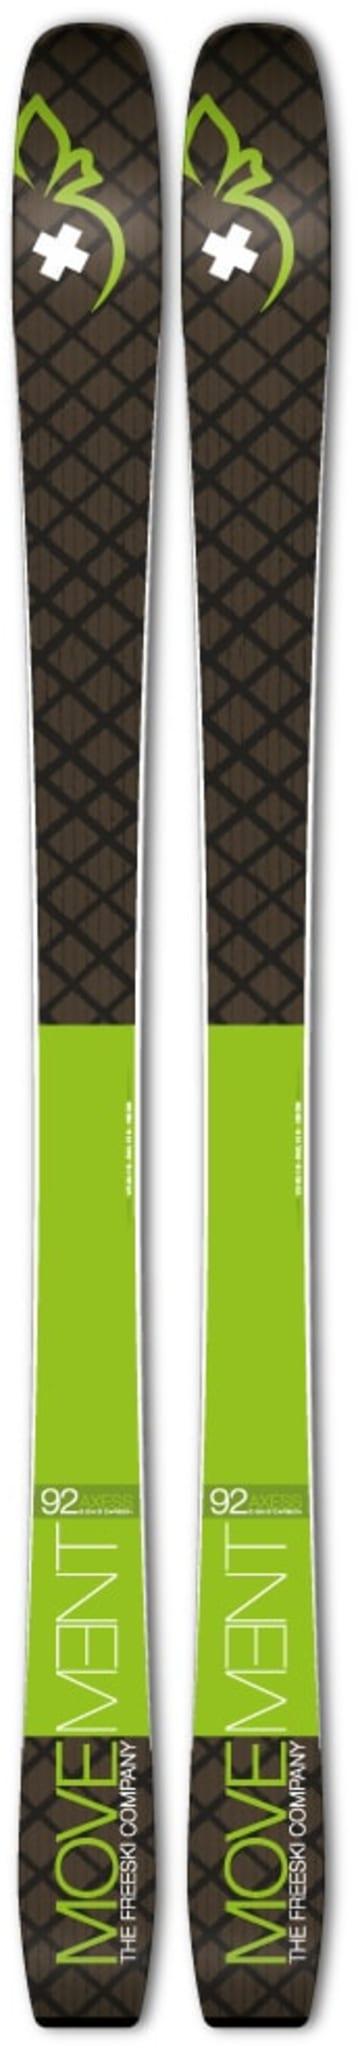 AXESS 92 & Marker Alpinist 12